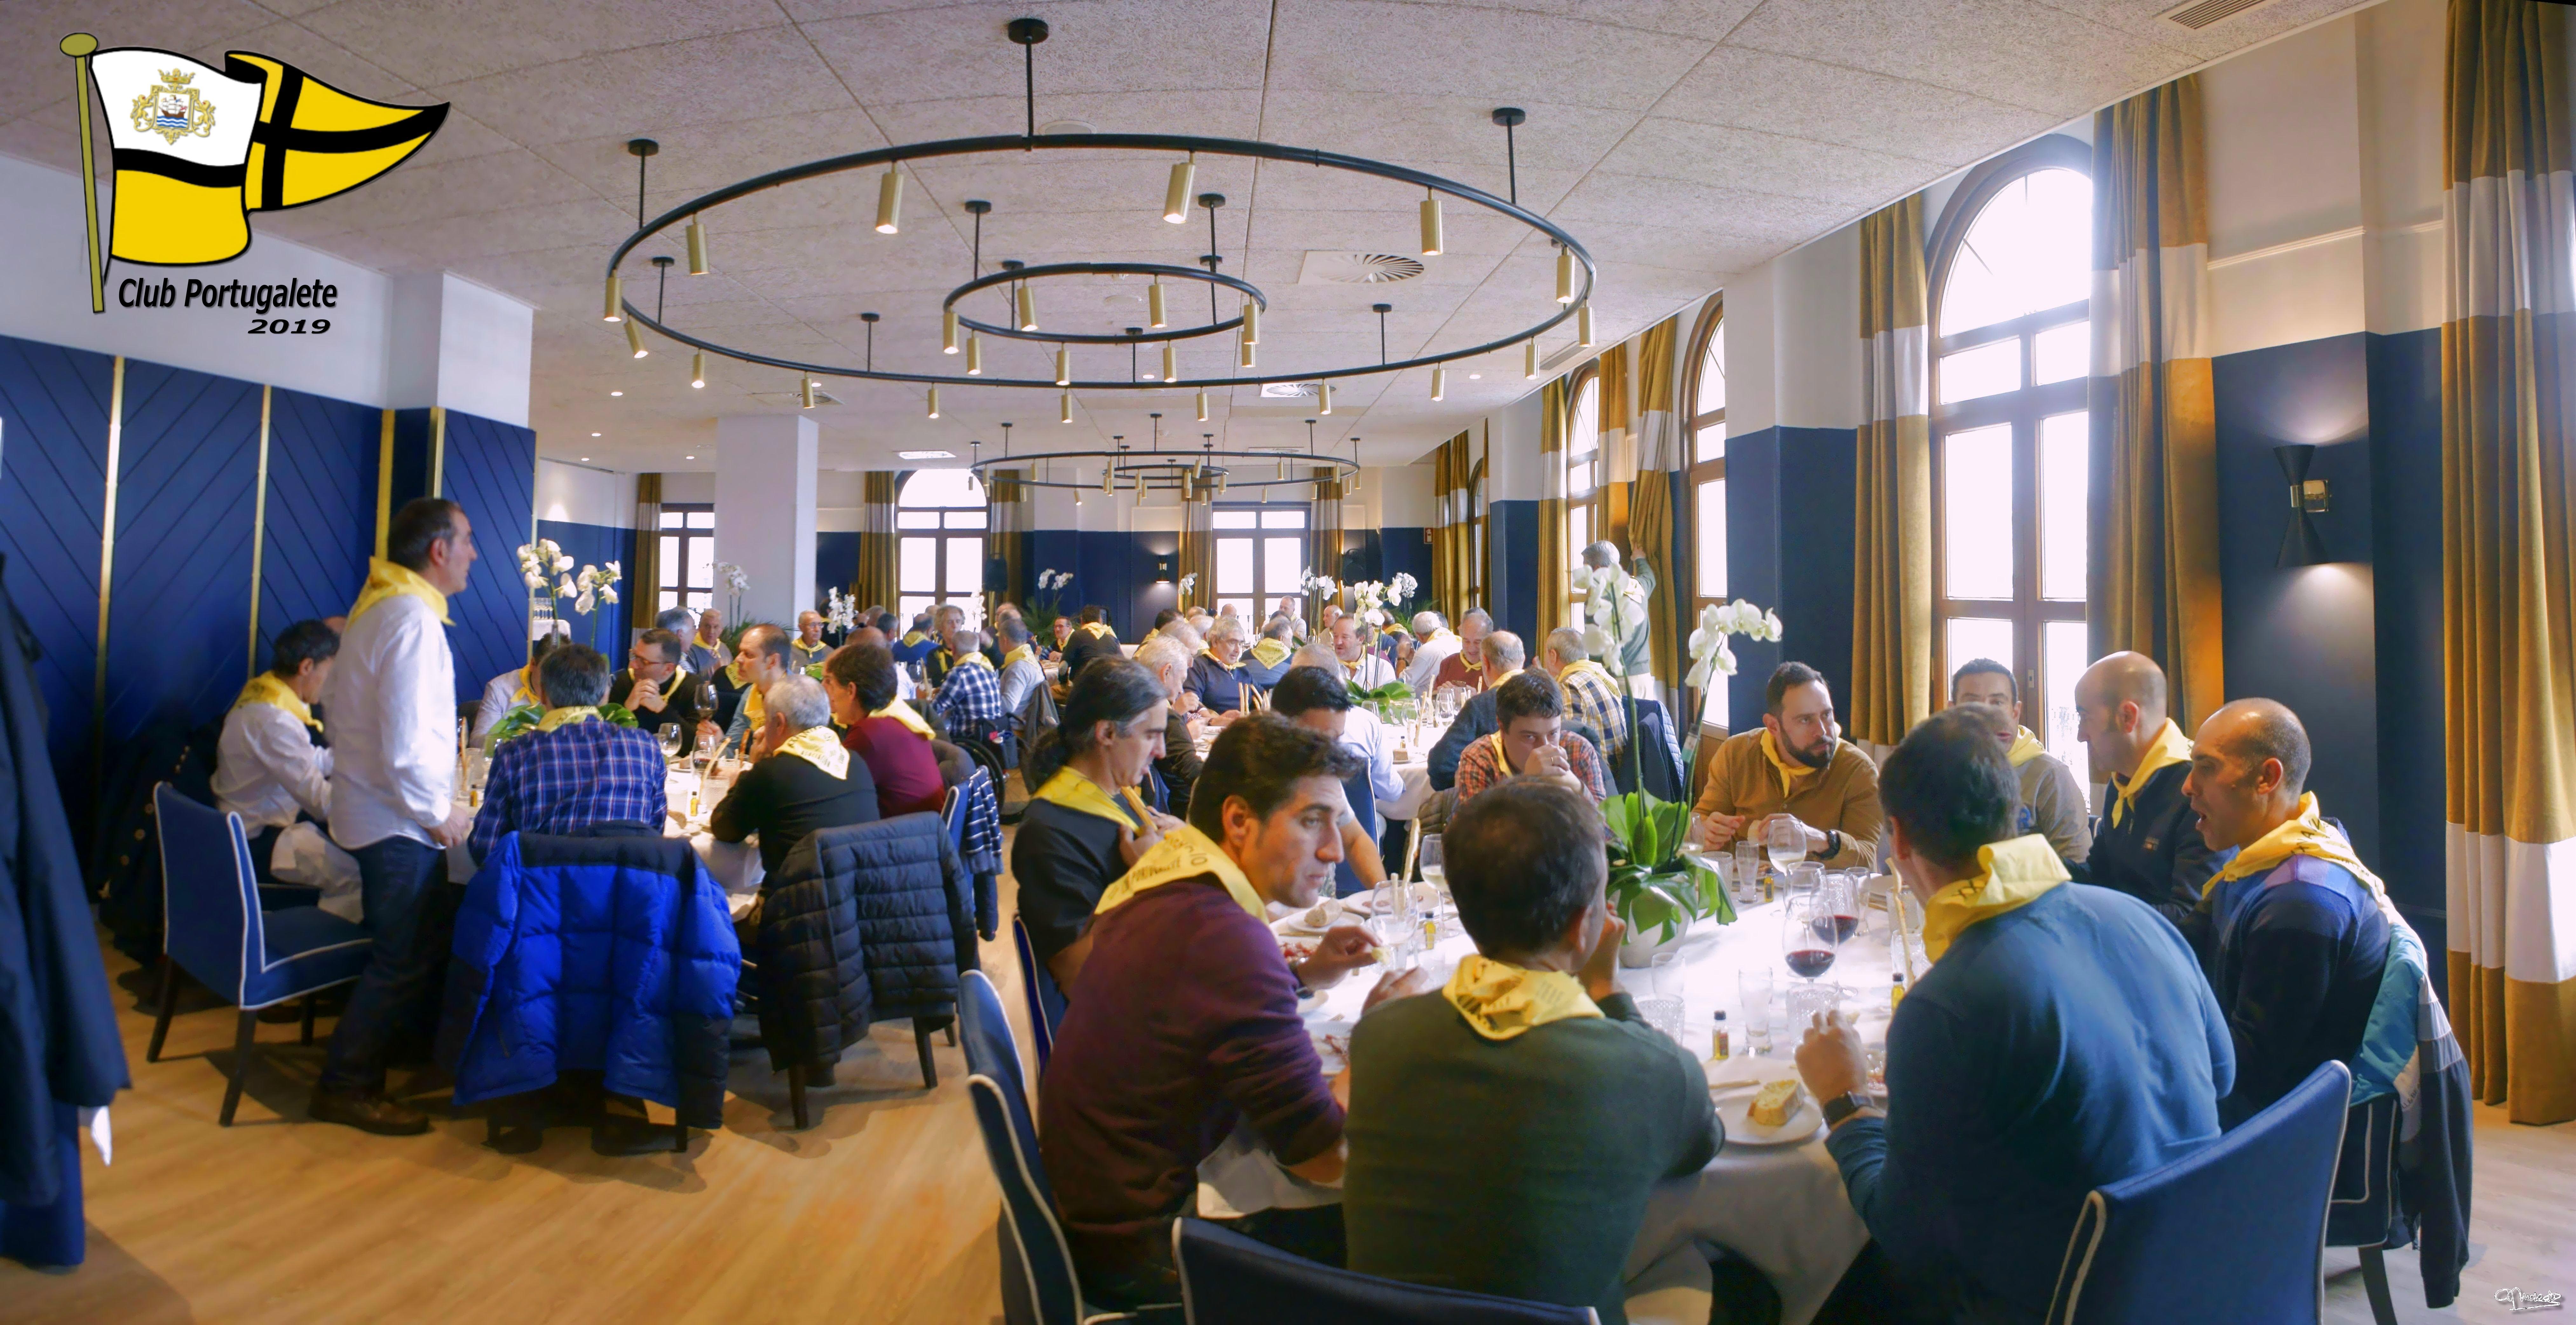 XXXIV Encuentro ex-Club Portugalete 2019